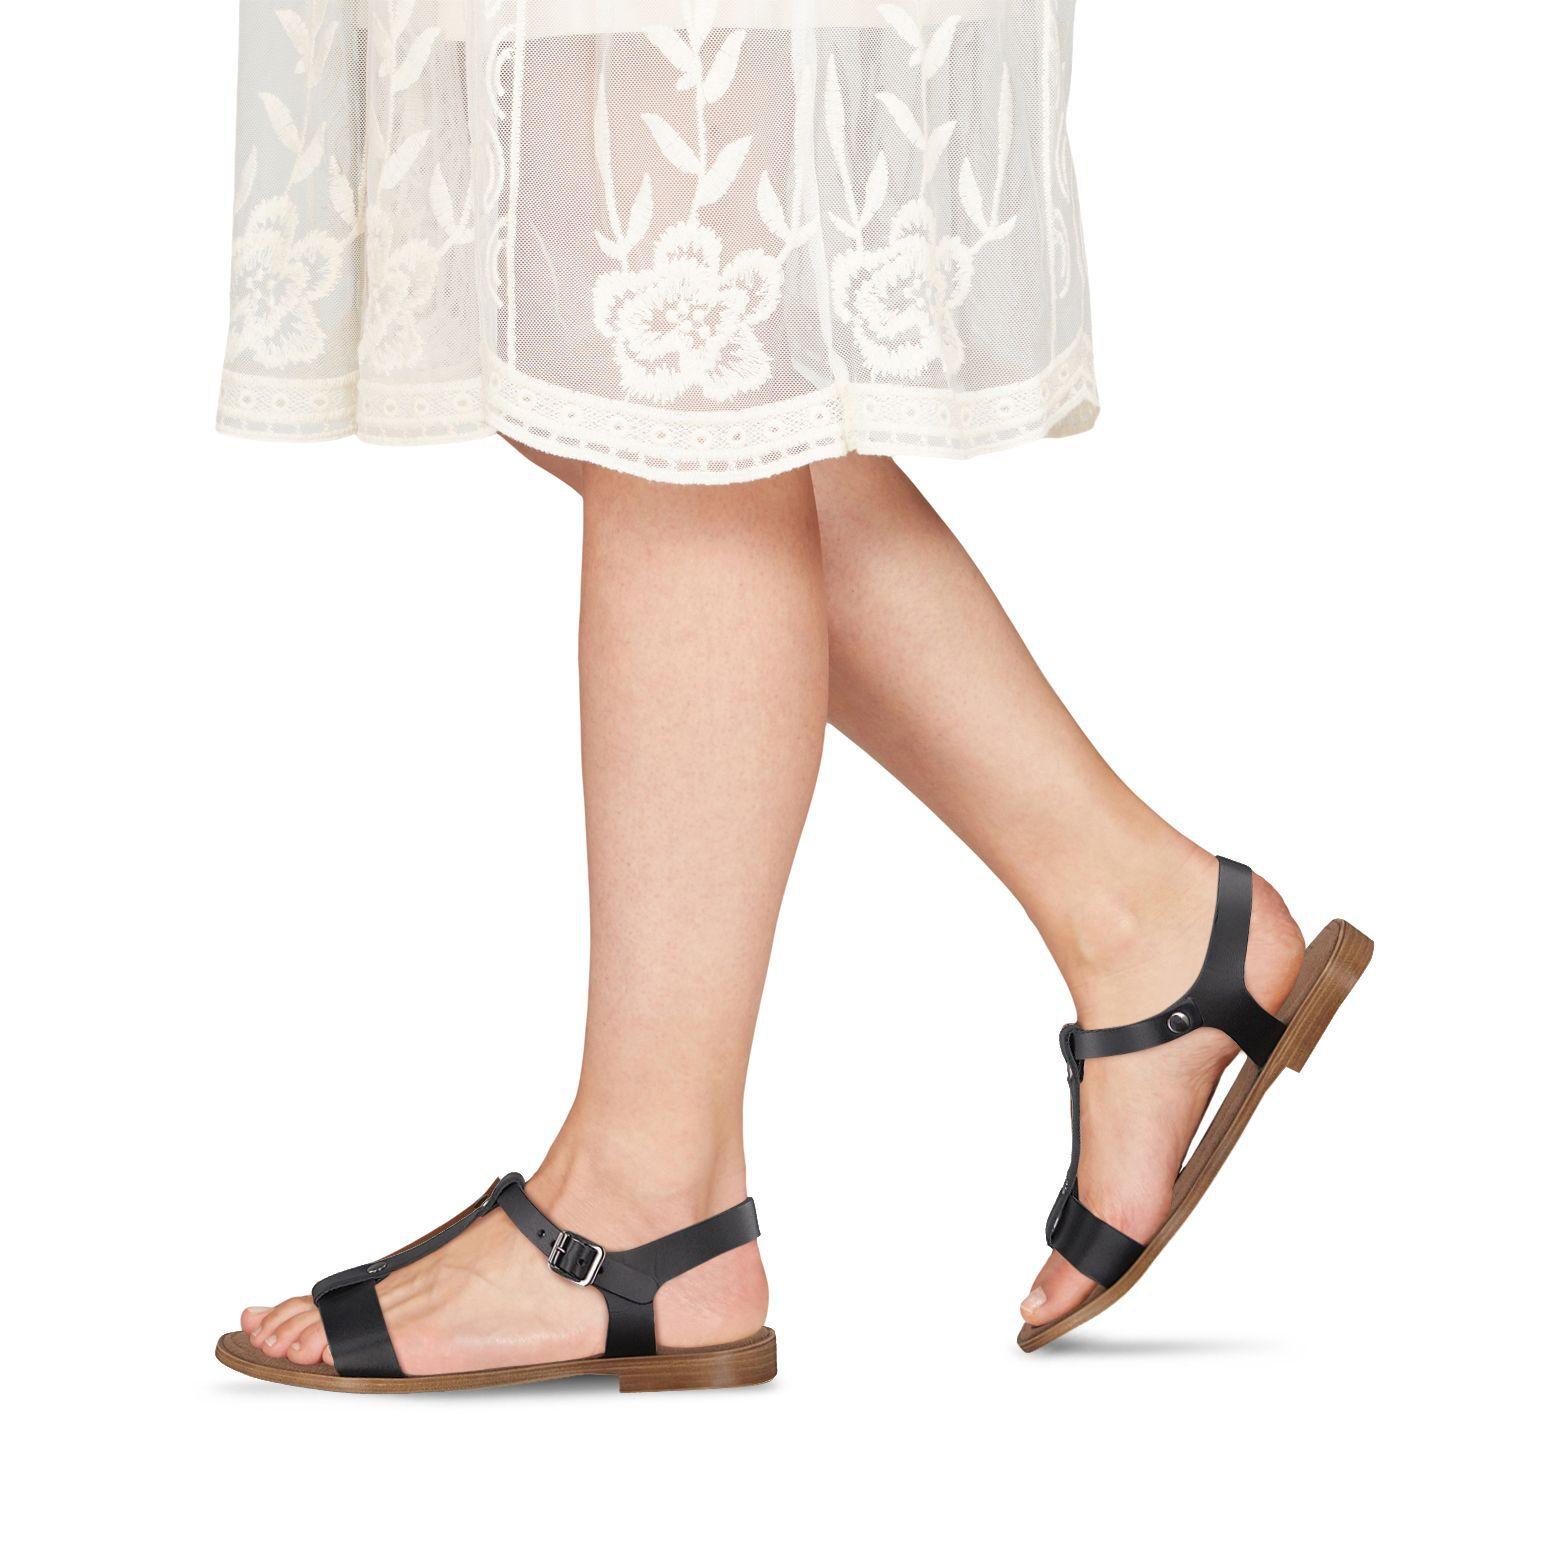 Damen Latschen/Zehentrenner/Flip Flops/Flache Sohle/Sommerschuhe/Bequeme Freizeitschuhe/Sandale/Pink/Rosa, EU 41